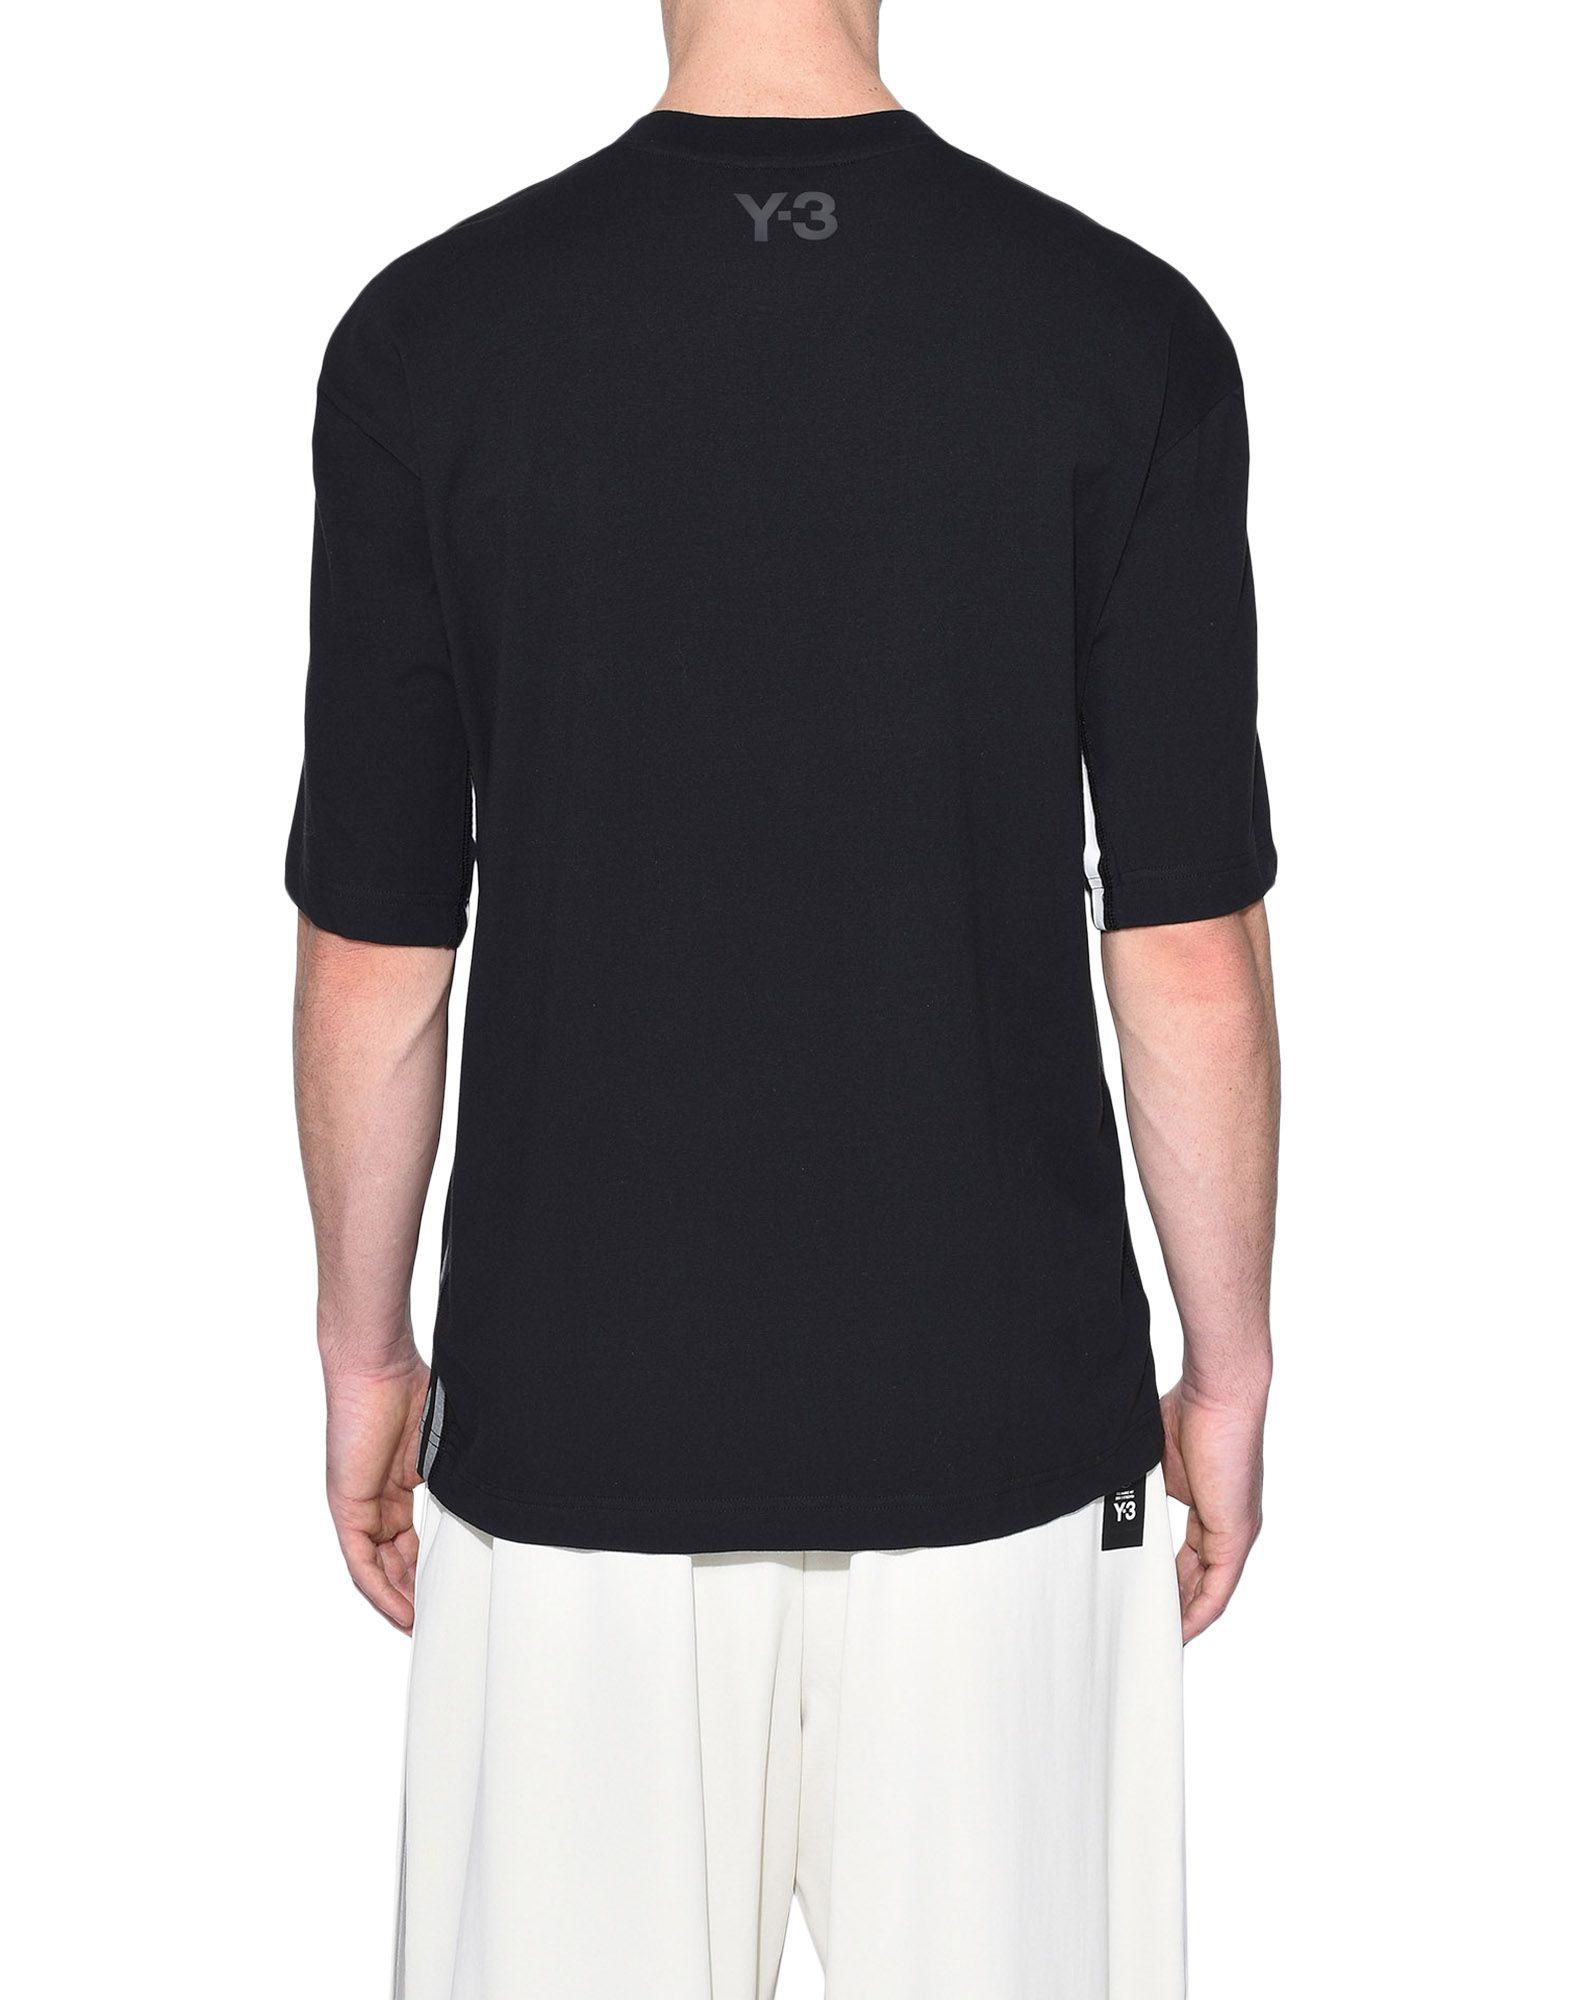 Y-3 Y-3 3-Stripes Tee Short sleeve t-shirt Man d